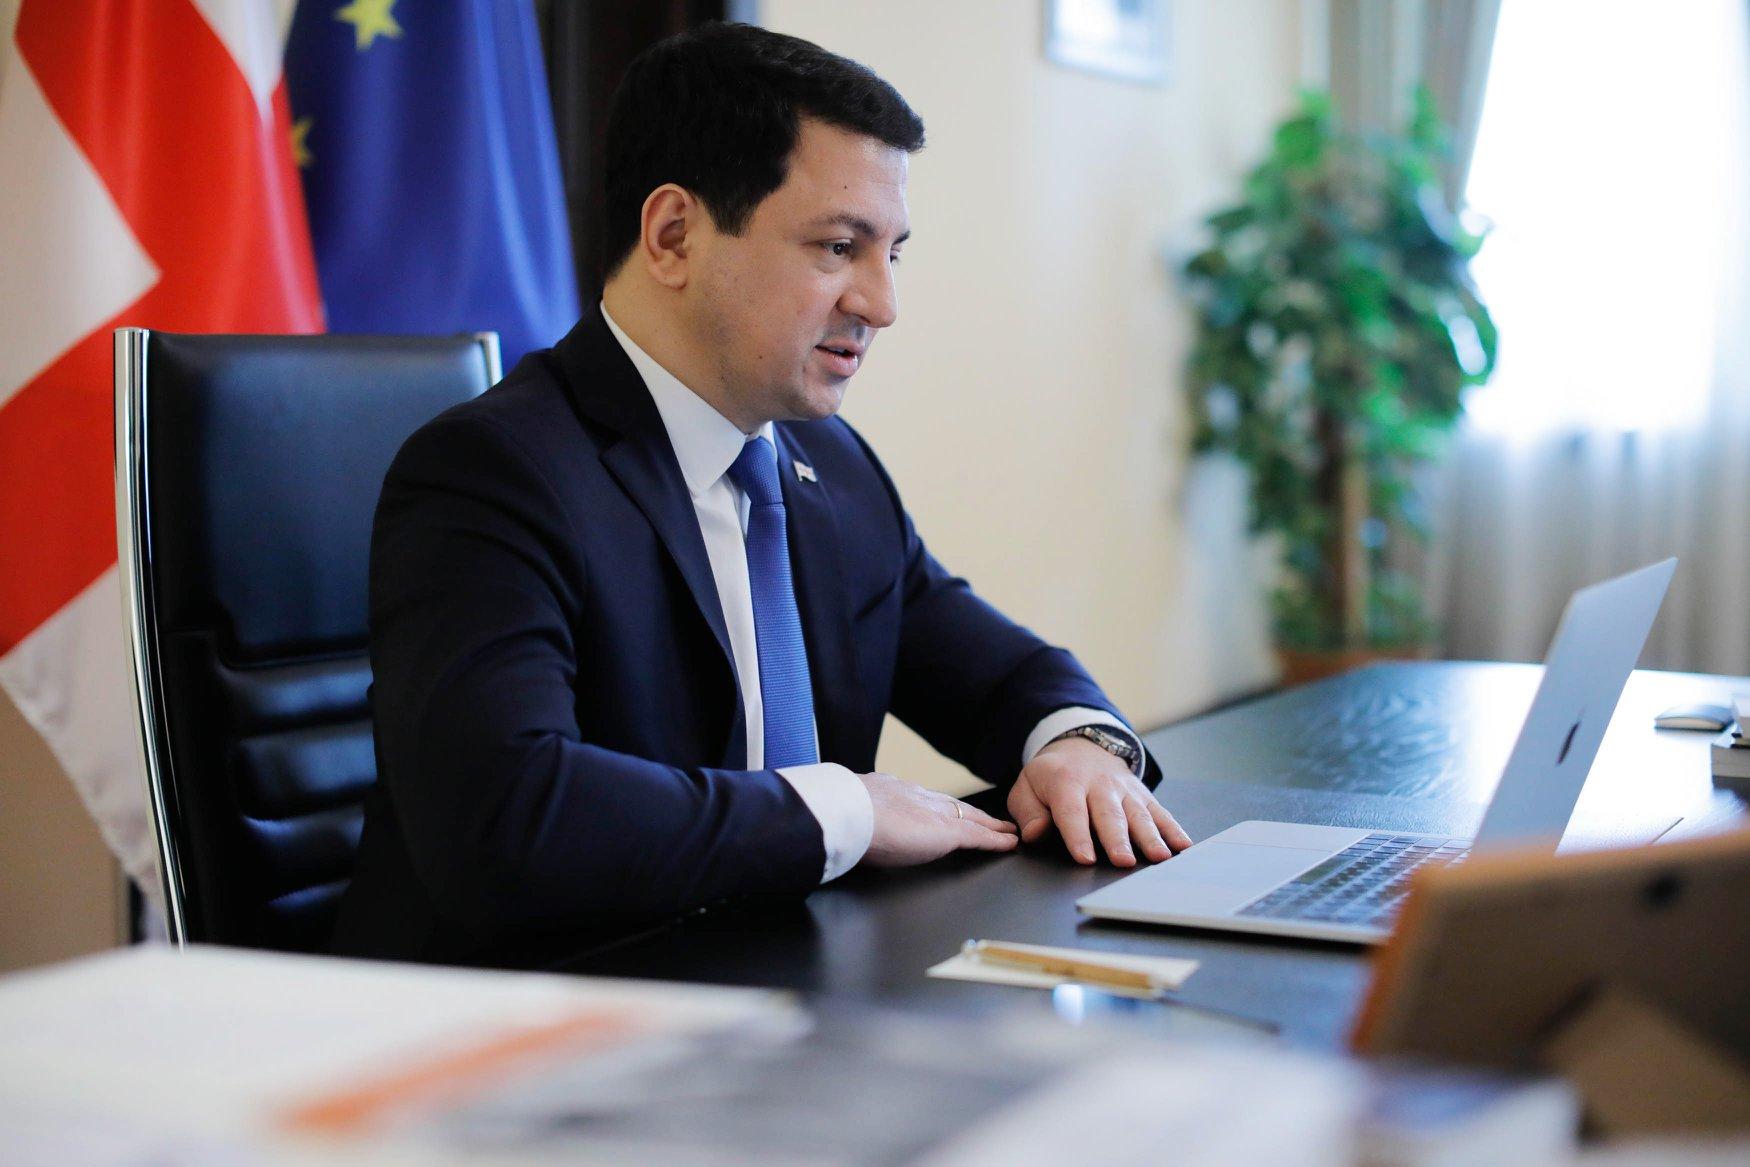 Archil Talakvadze 3 выборы выборы